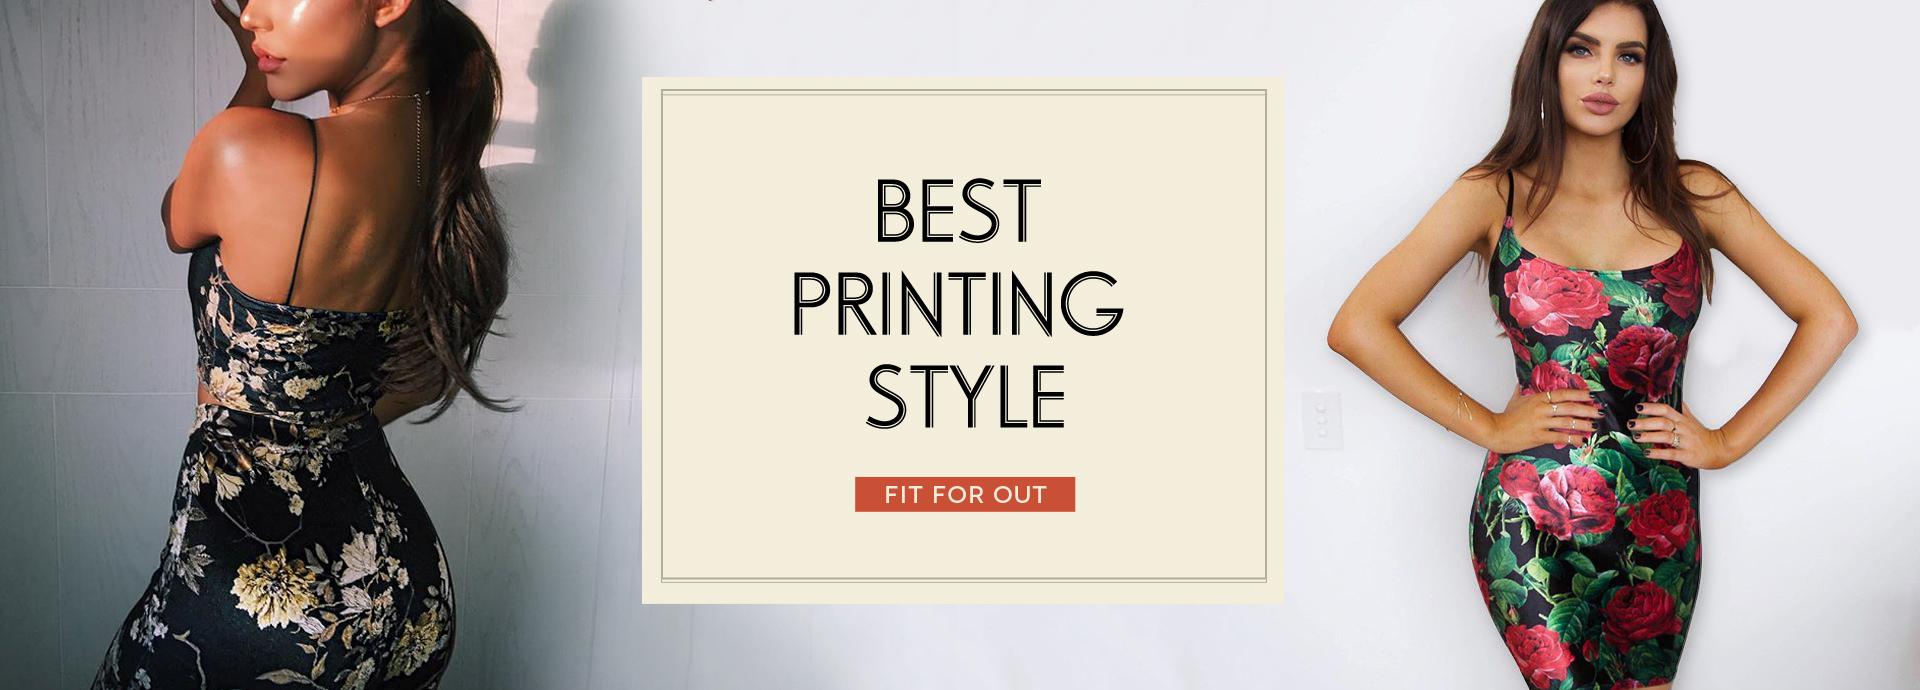 Best Printing Style